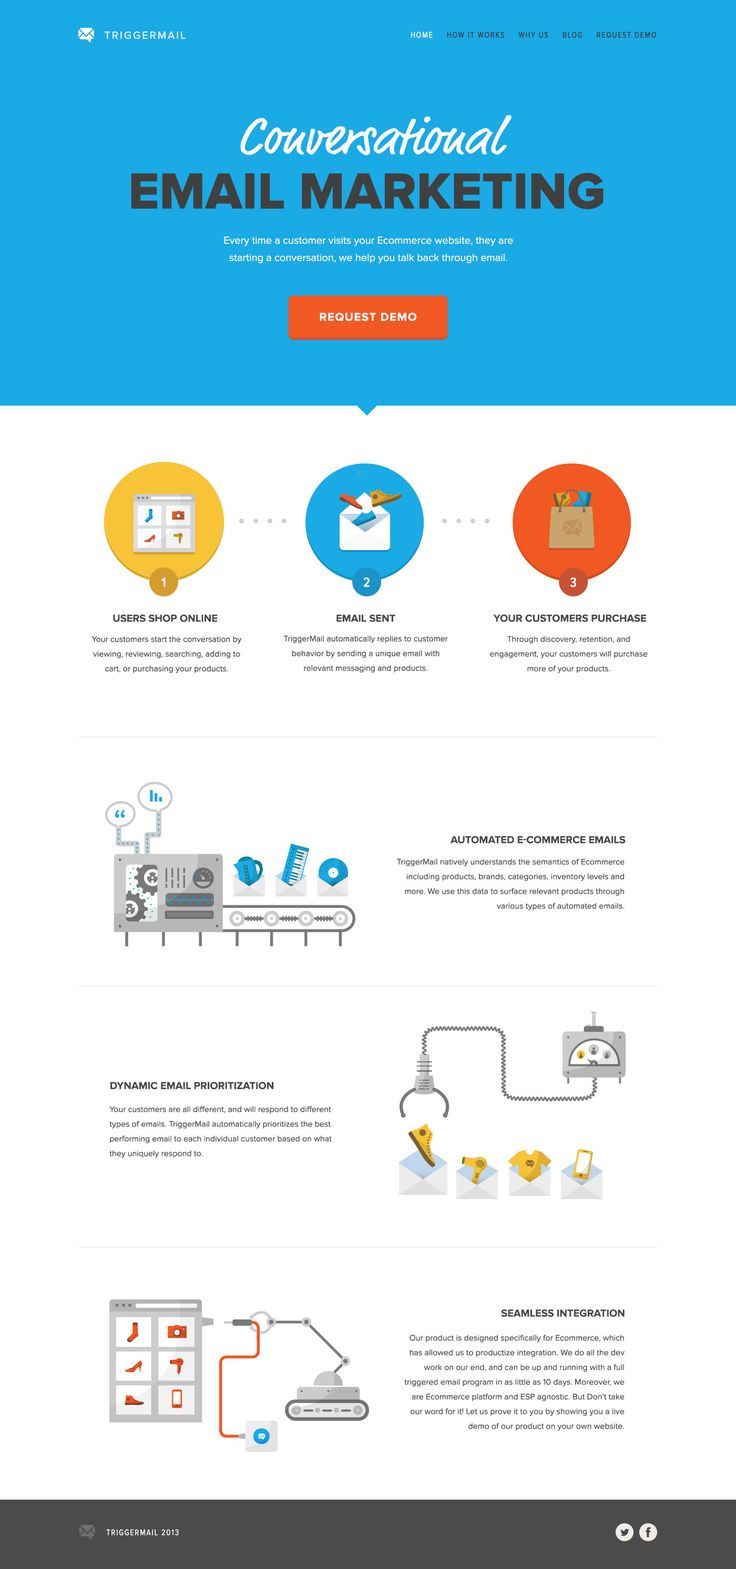 TriggerMail #webdesign #illustration